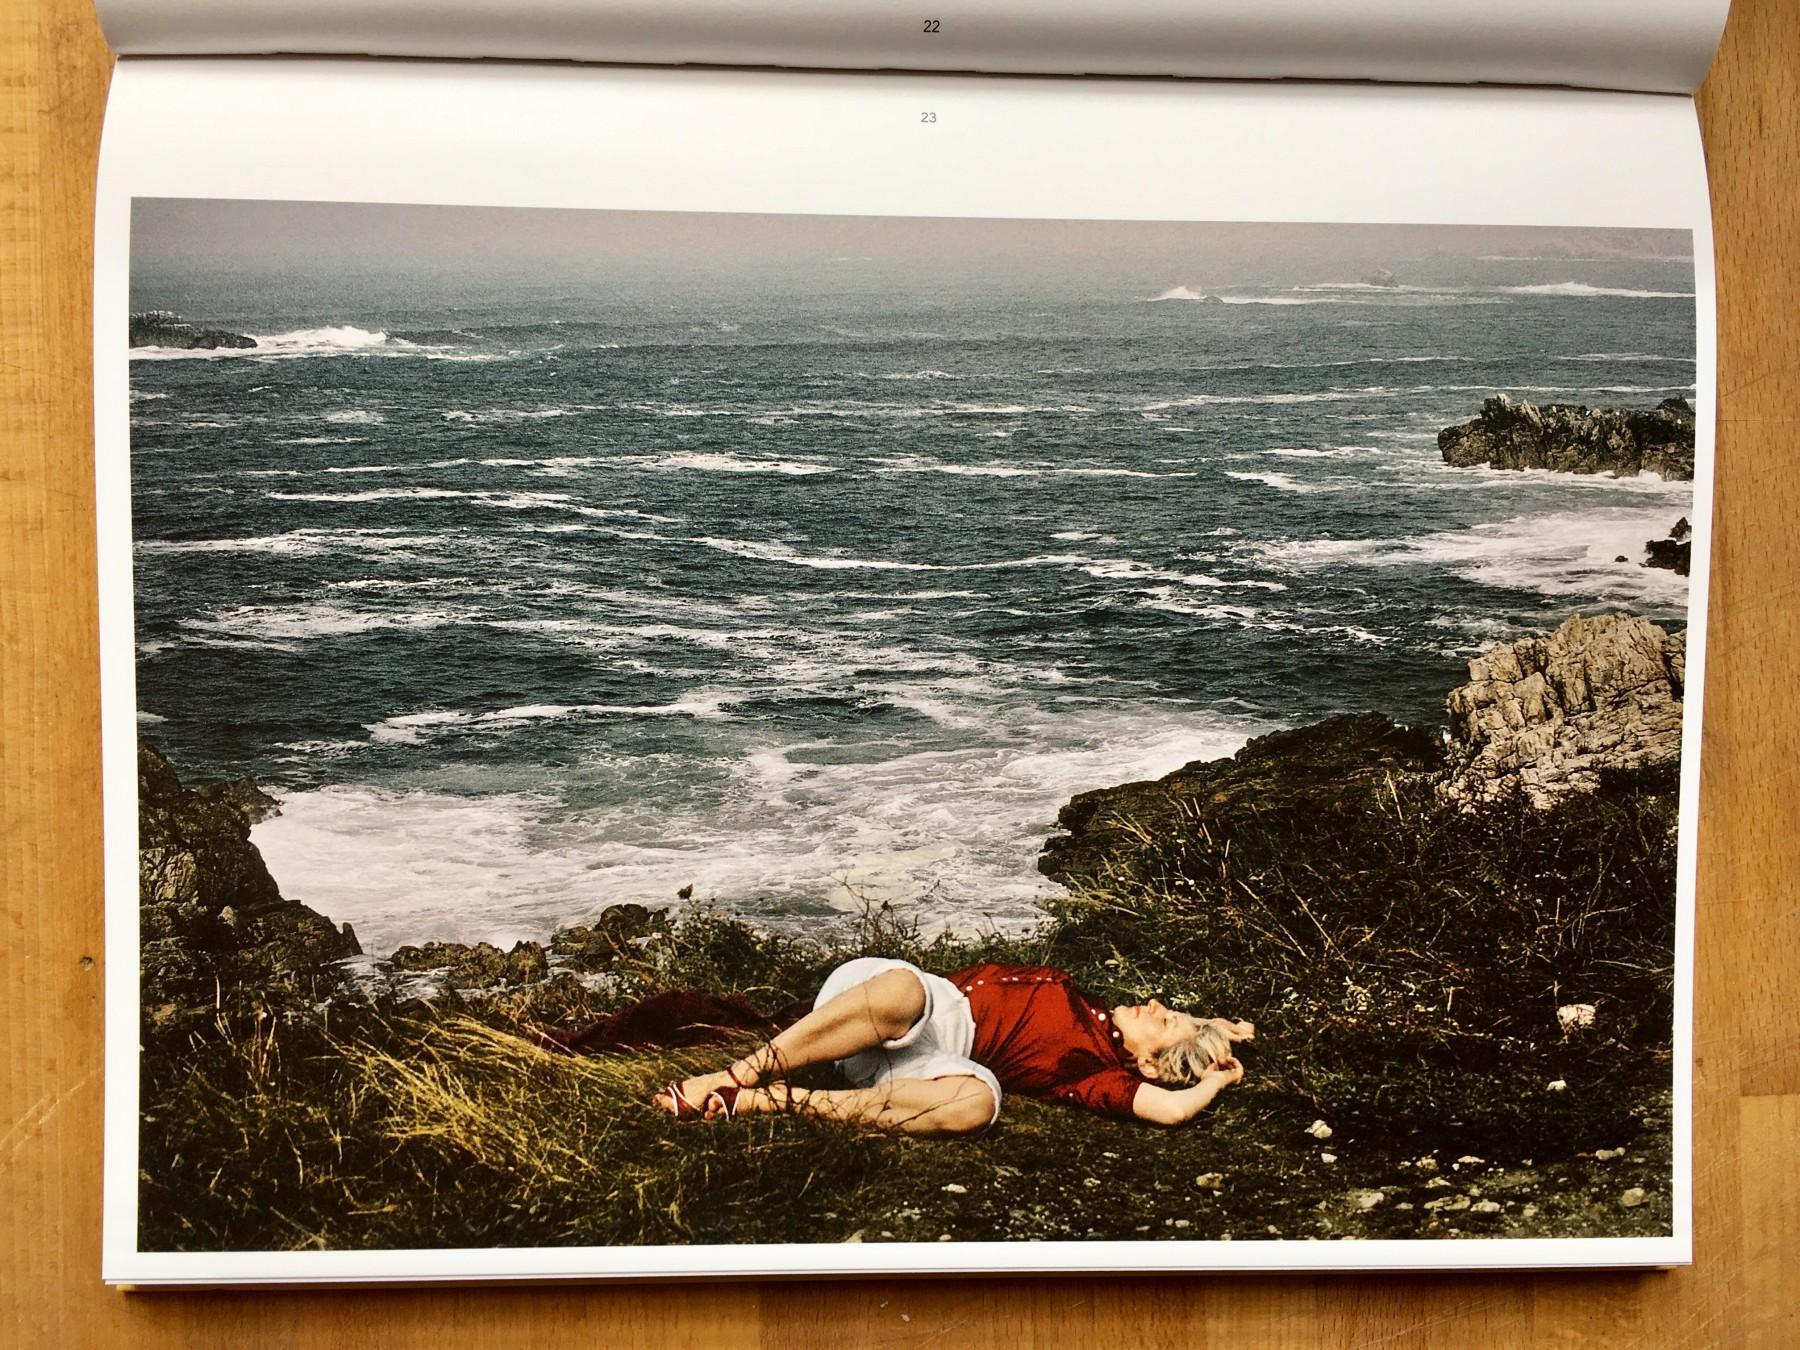 enster-blog-di-cultura-fotografica-harry-gruyaert-rivage-105.JPG